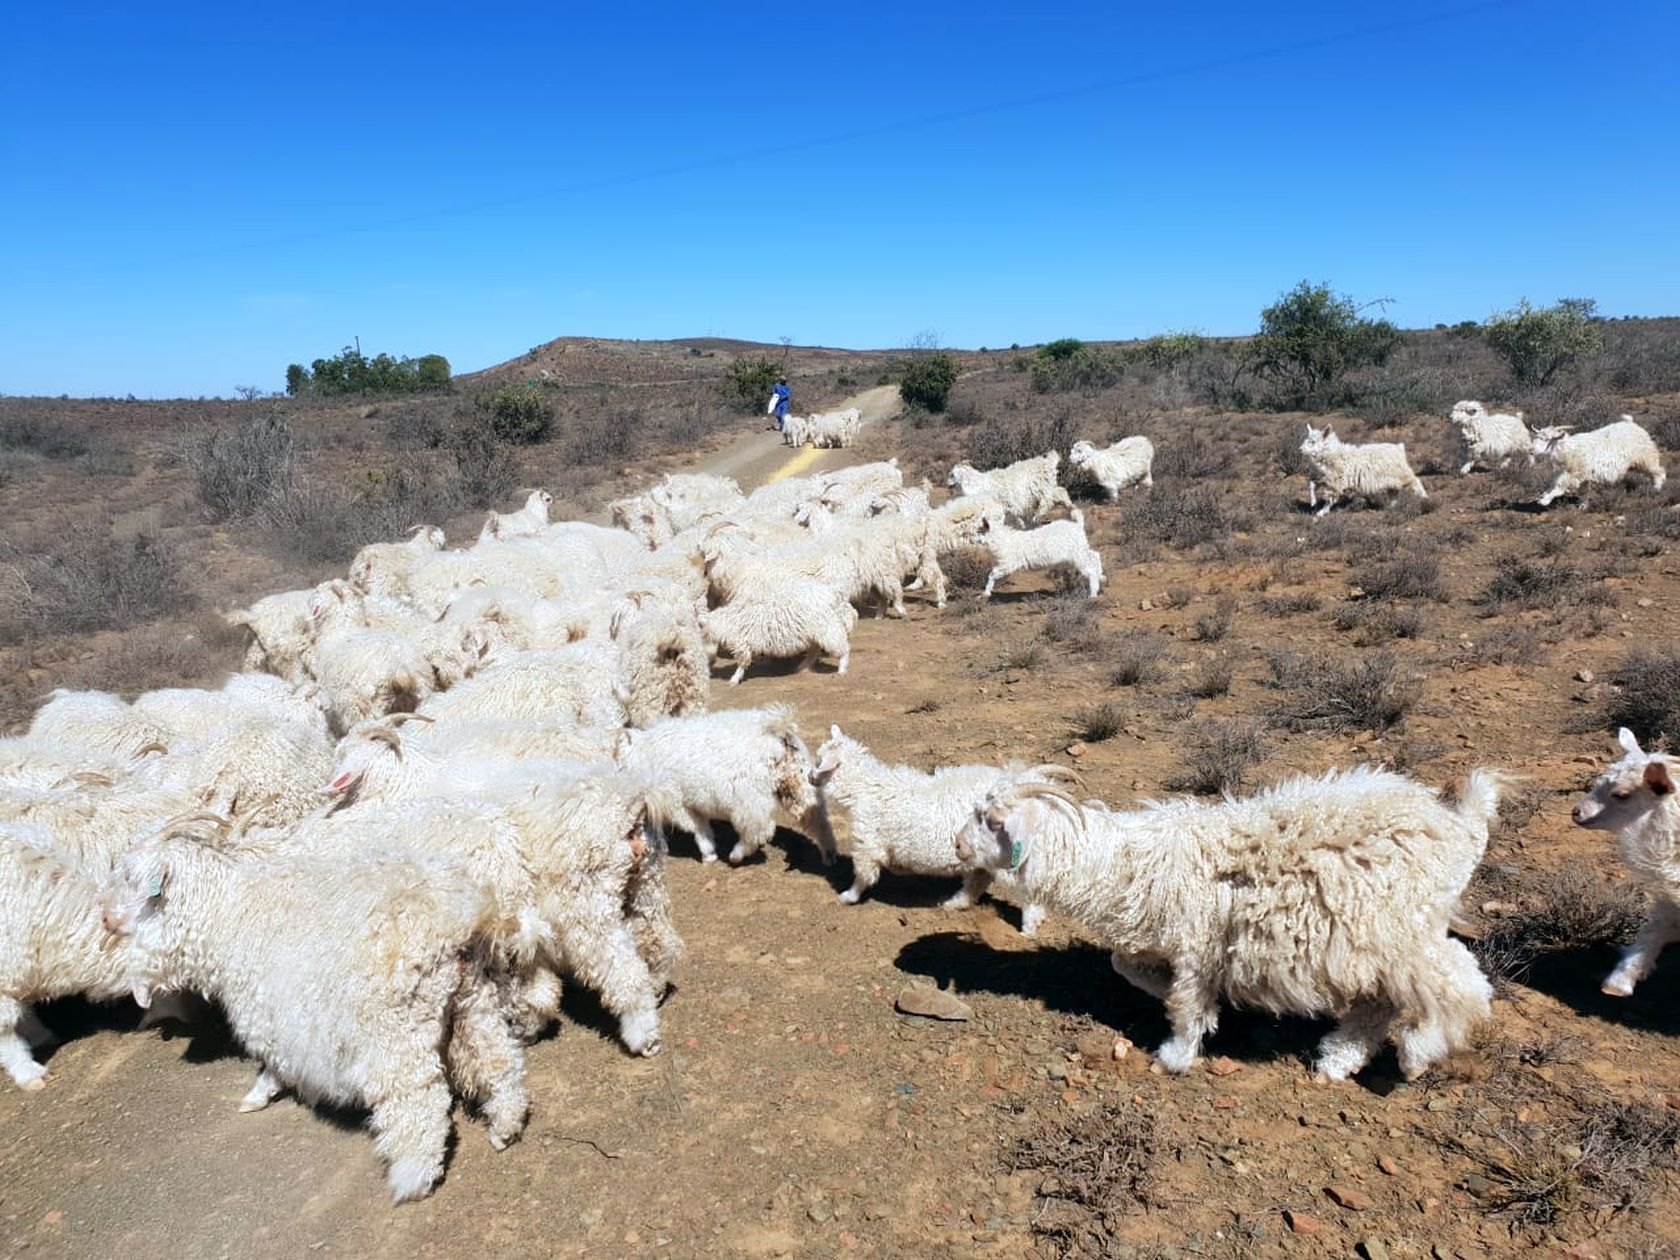 Eastern Cape farmers